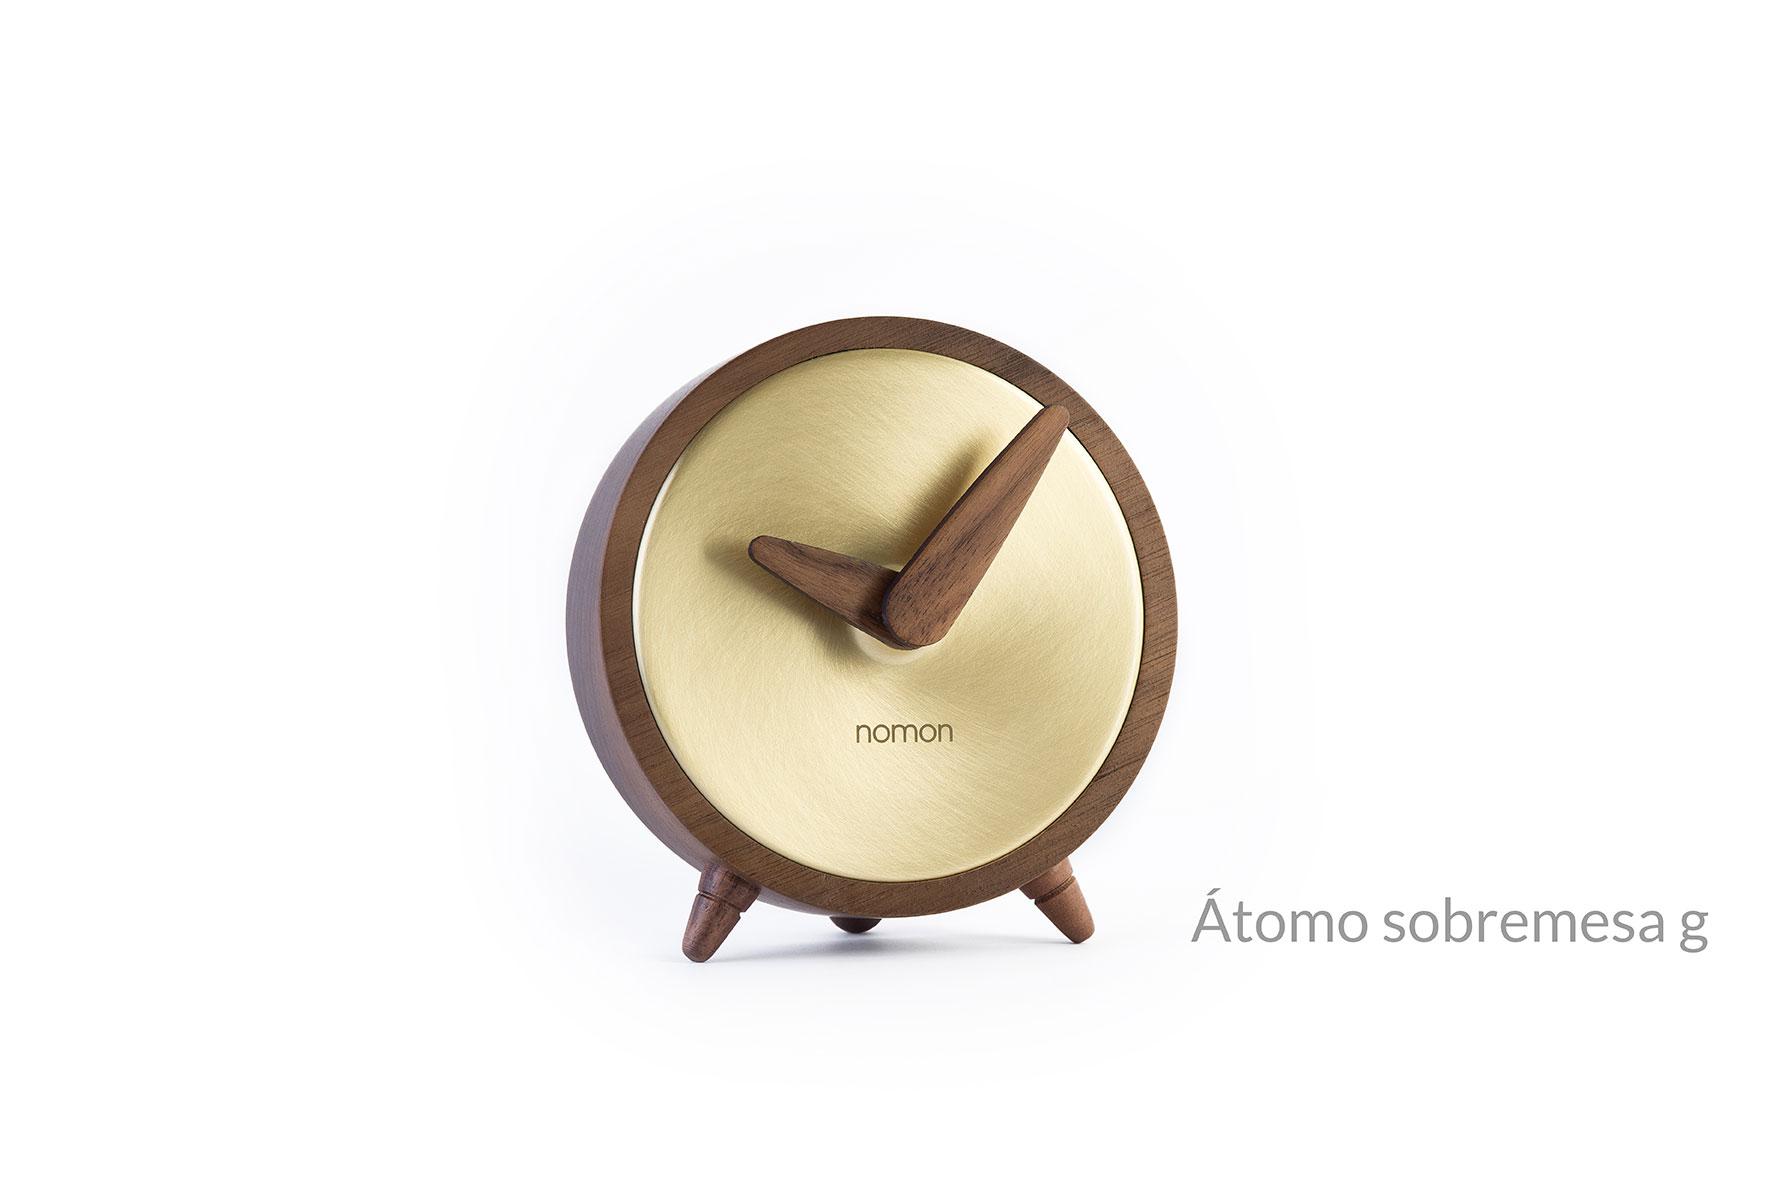 Atomo Sobremesa Nomon